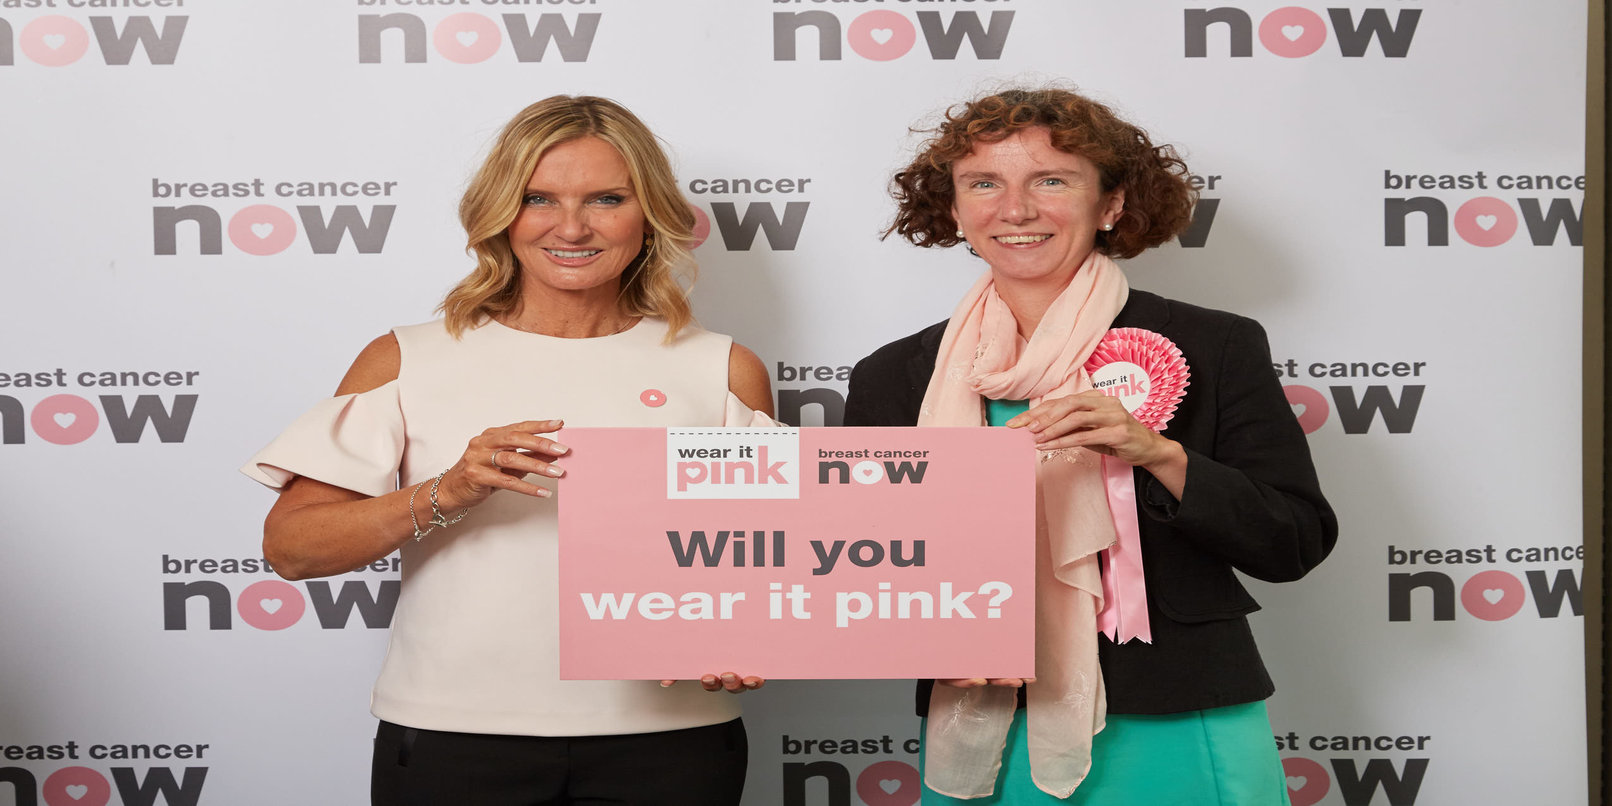 Breast_cancer_website.jpg